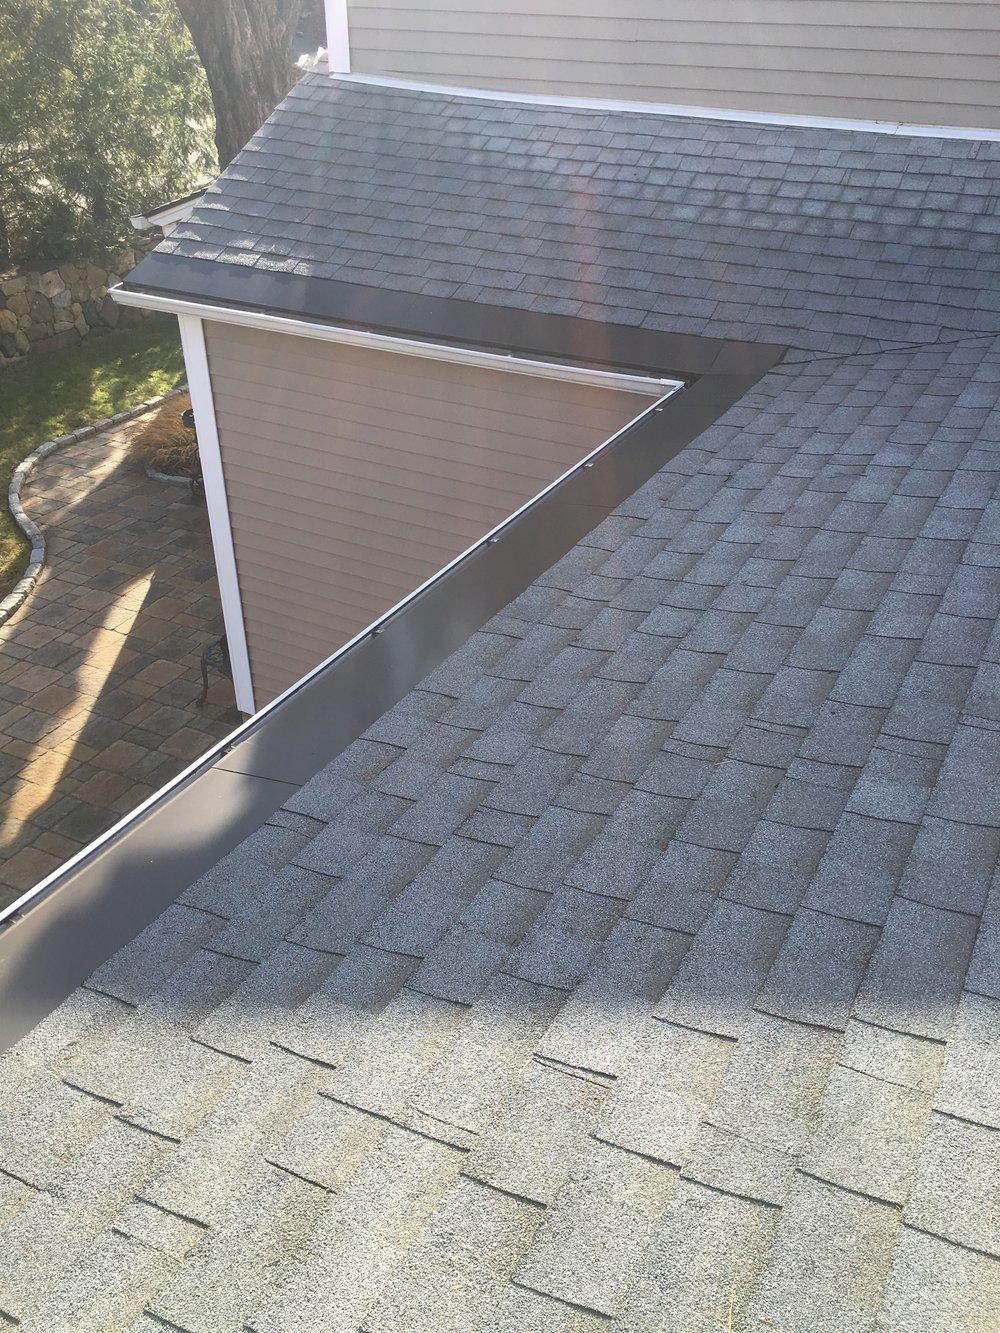 Roof Heat